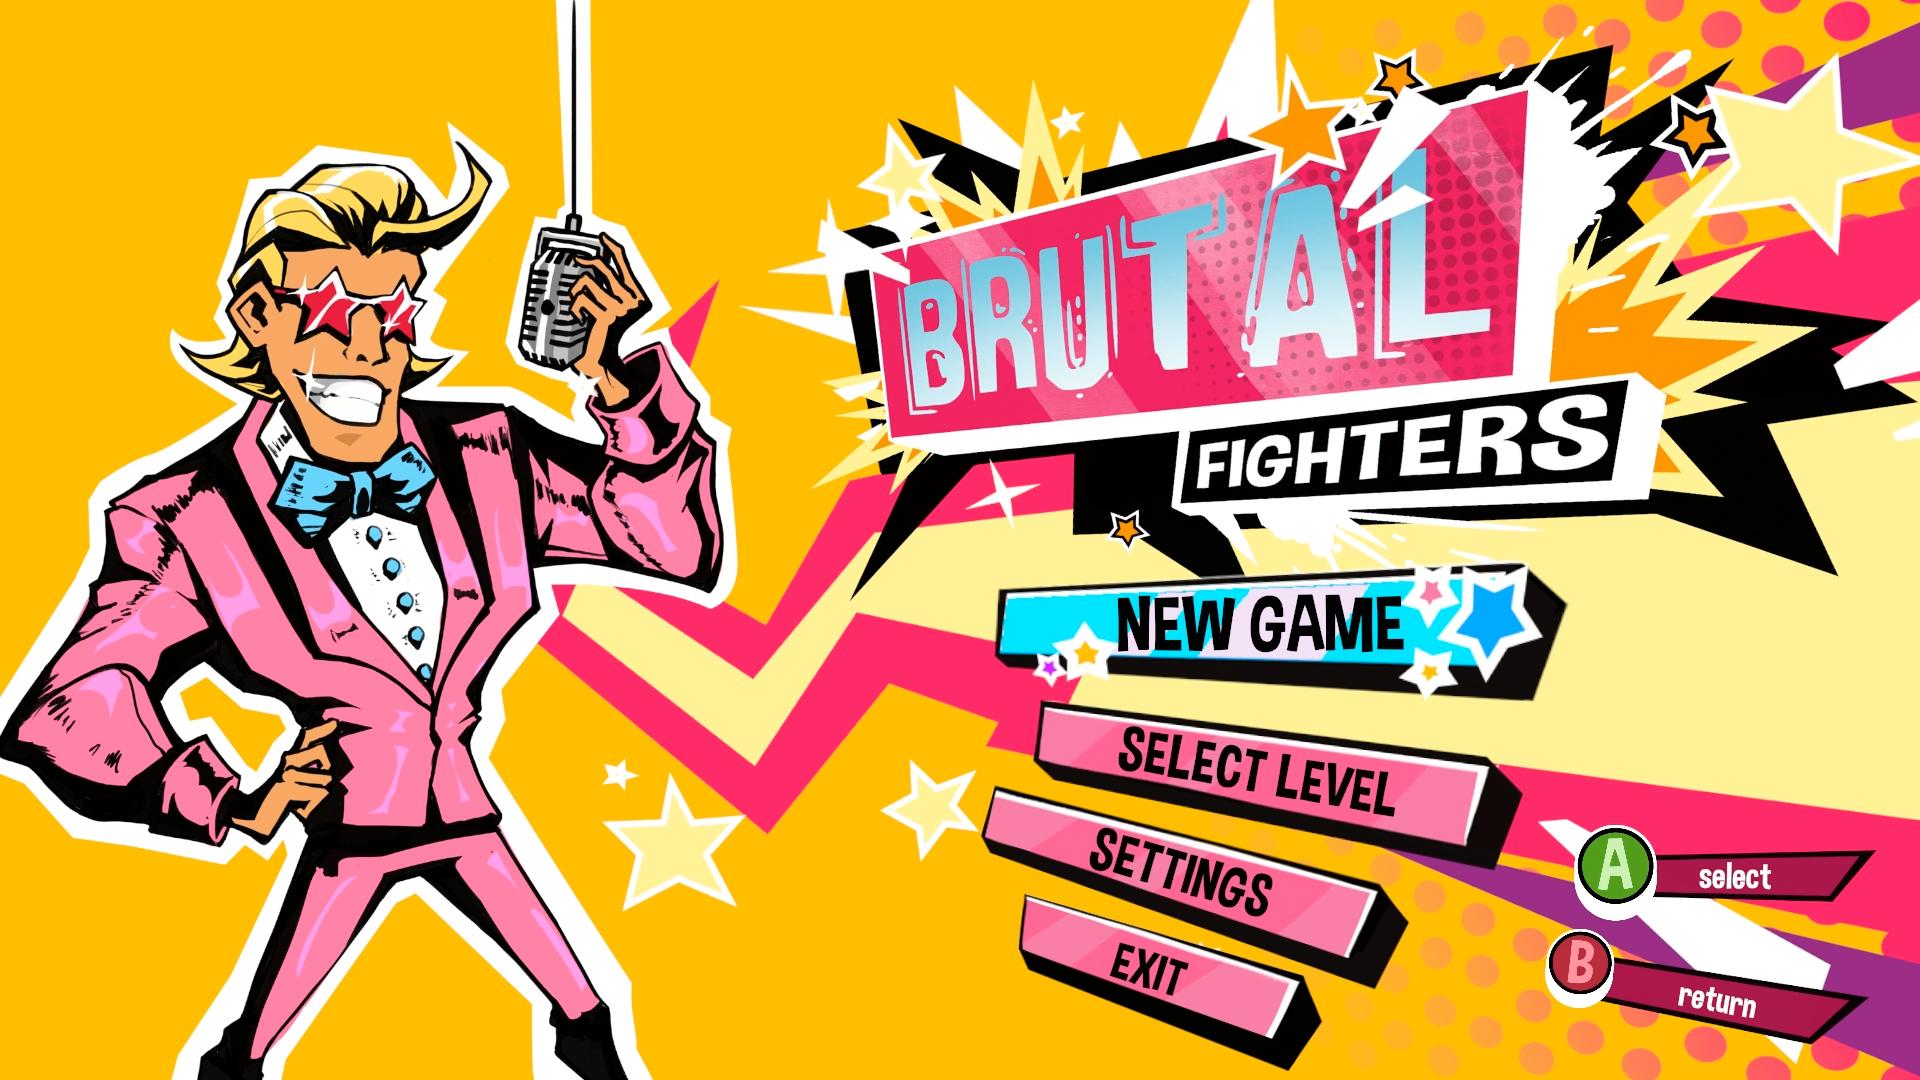 BrutalFighter_Screenshot (3).png